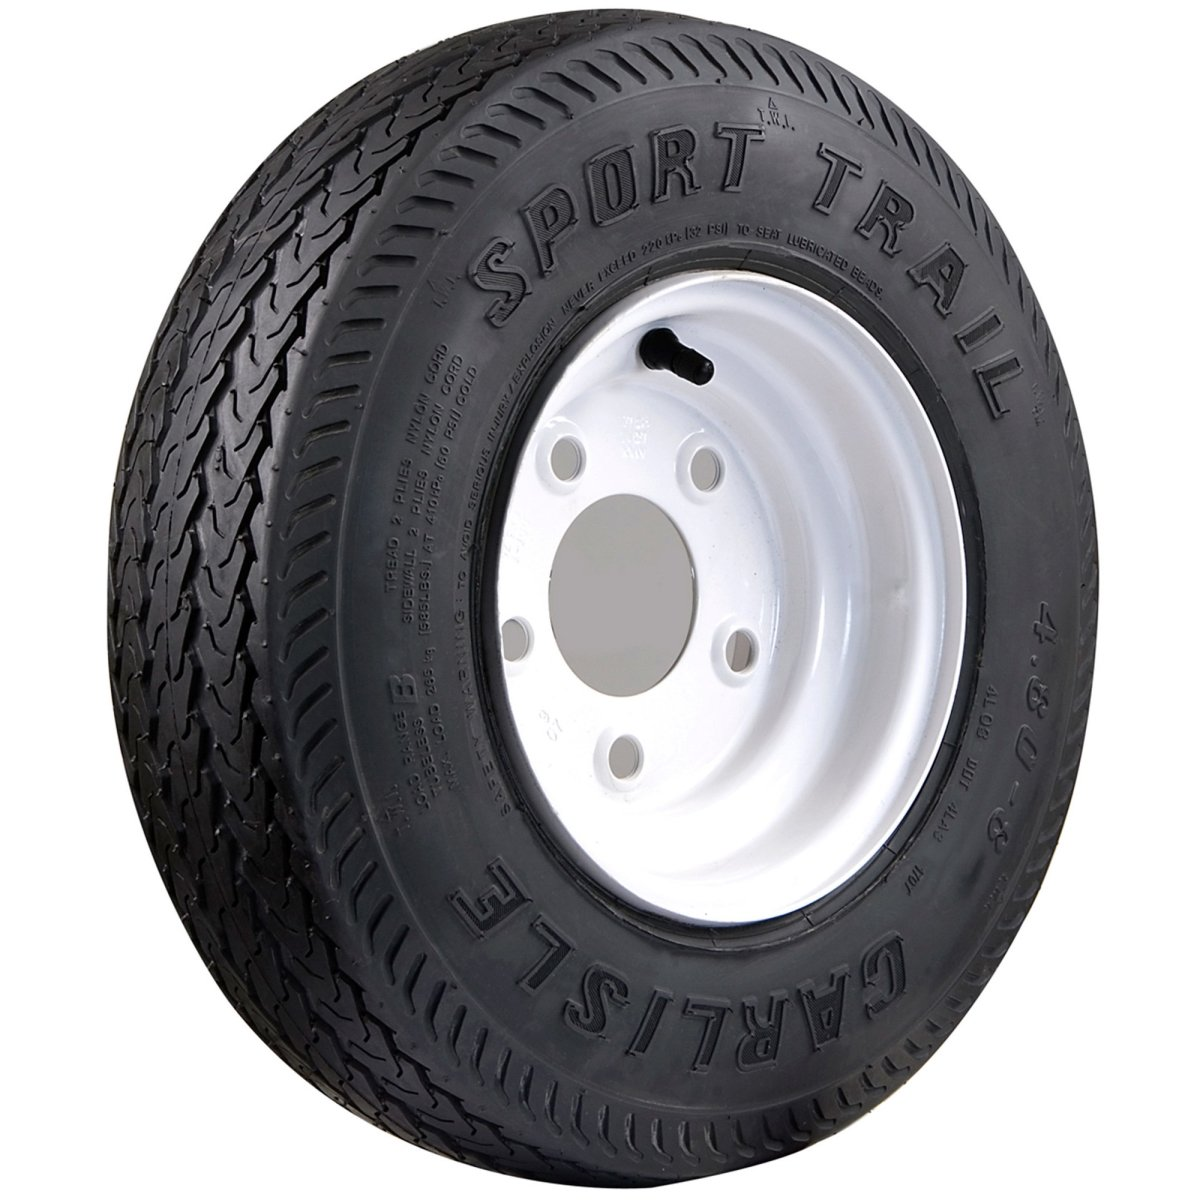 Carlisle Sport Trailer Tire 16.5x6.5-8